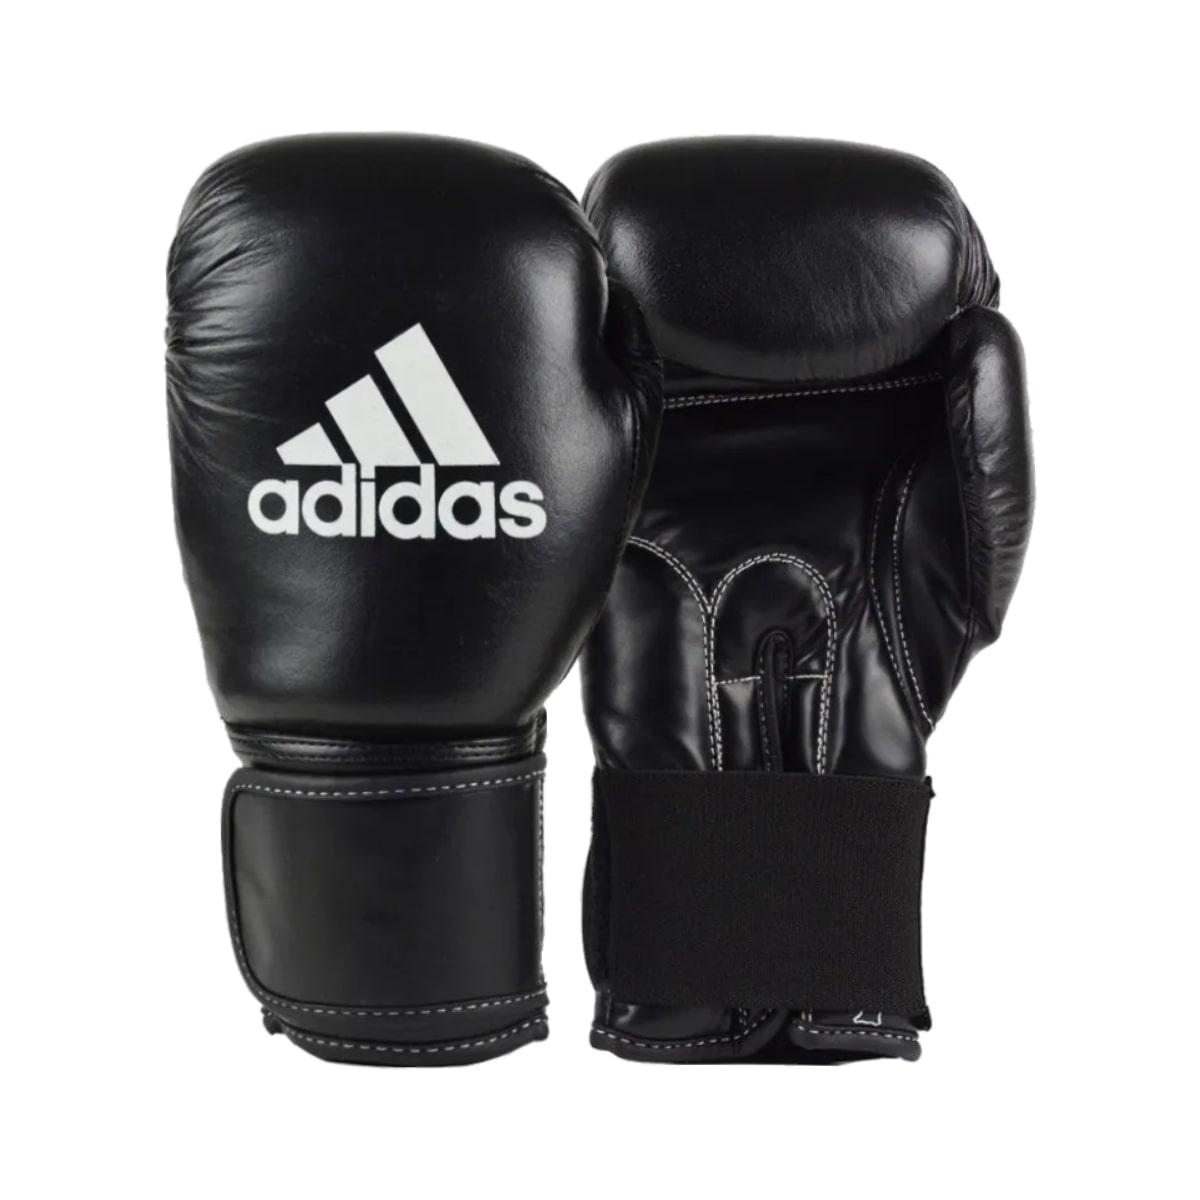 Luva Boxe Adidas Performer Couro - Preto